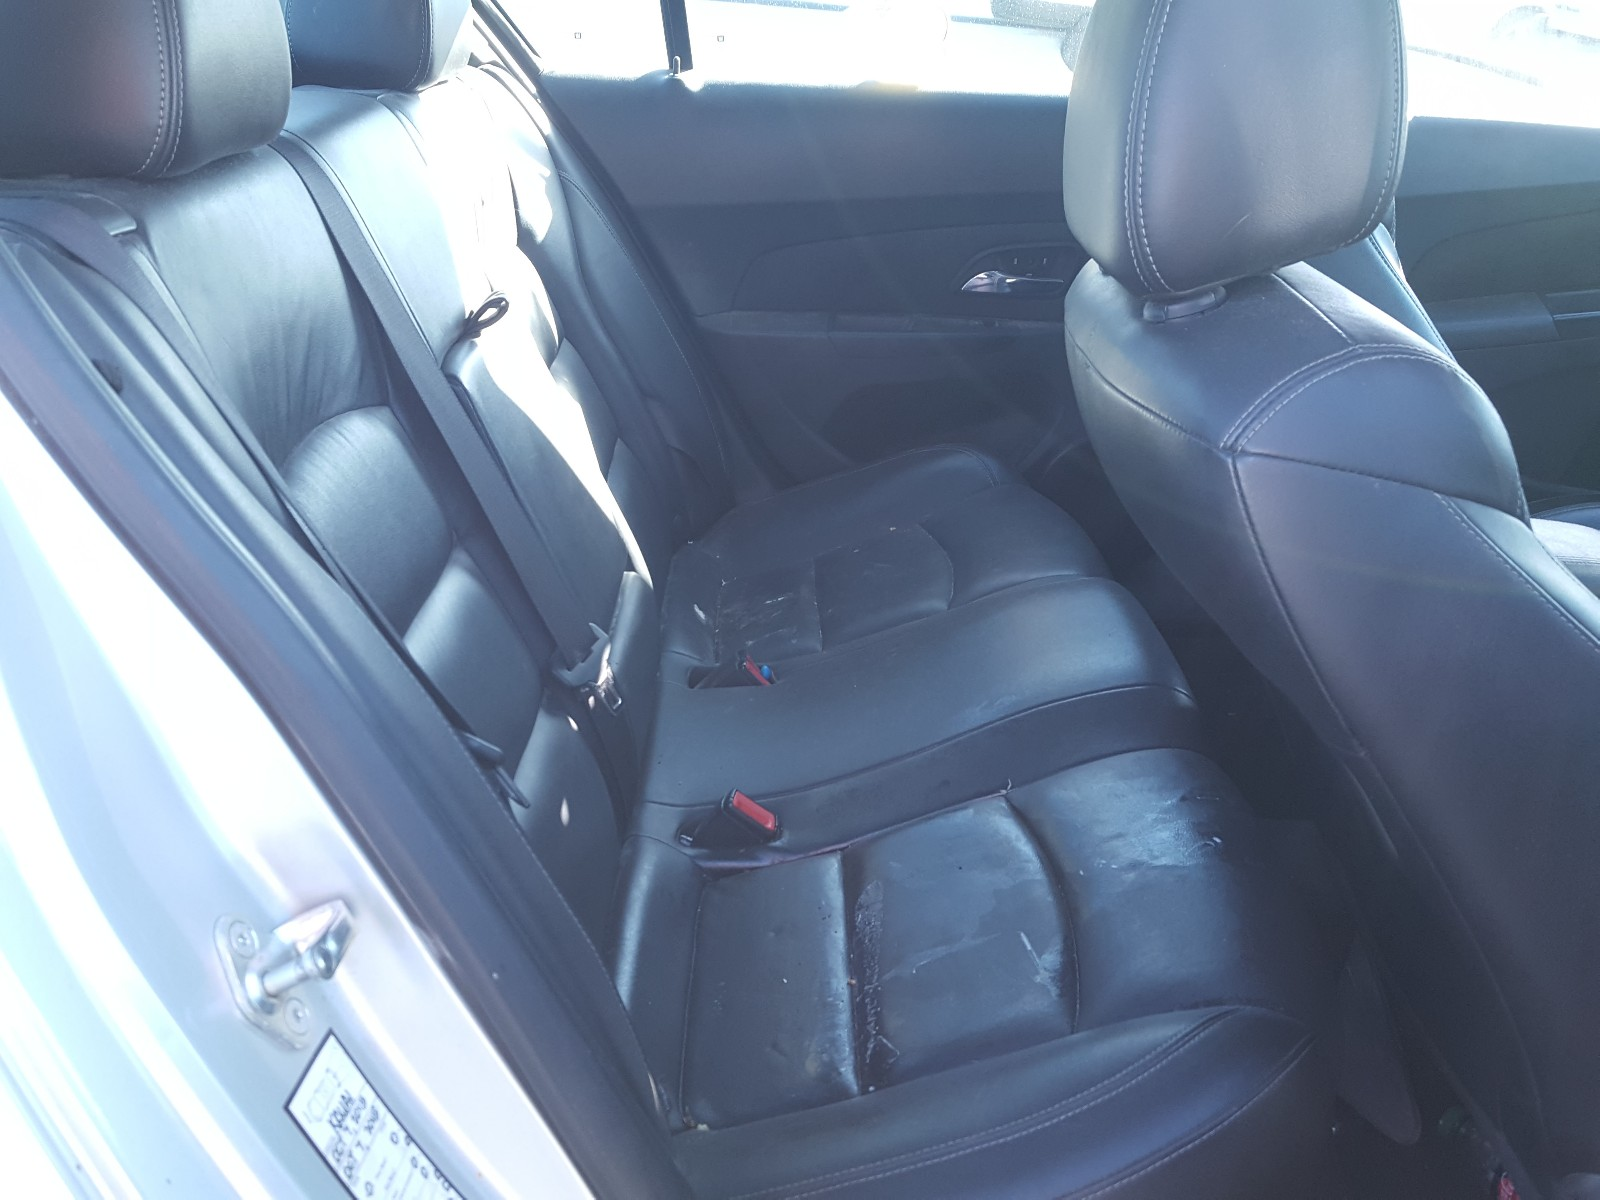 1G1PG5SB0G7130991 - 2016 Chevrolet Cruze Limi 1.4L detail view